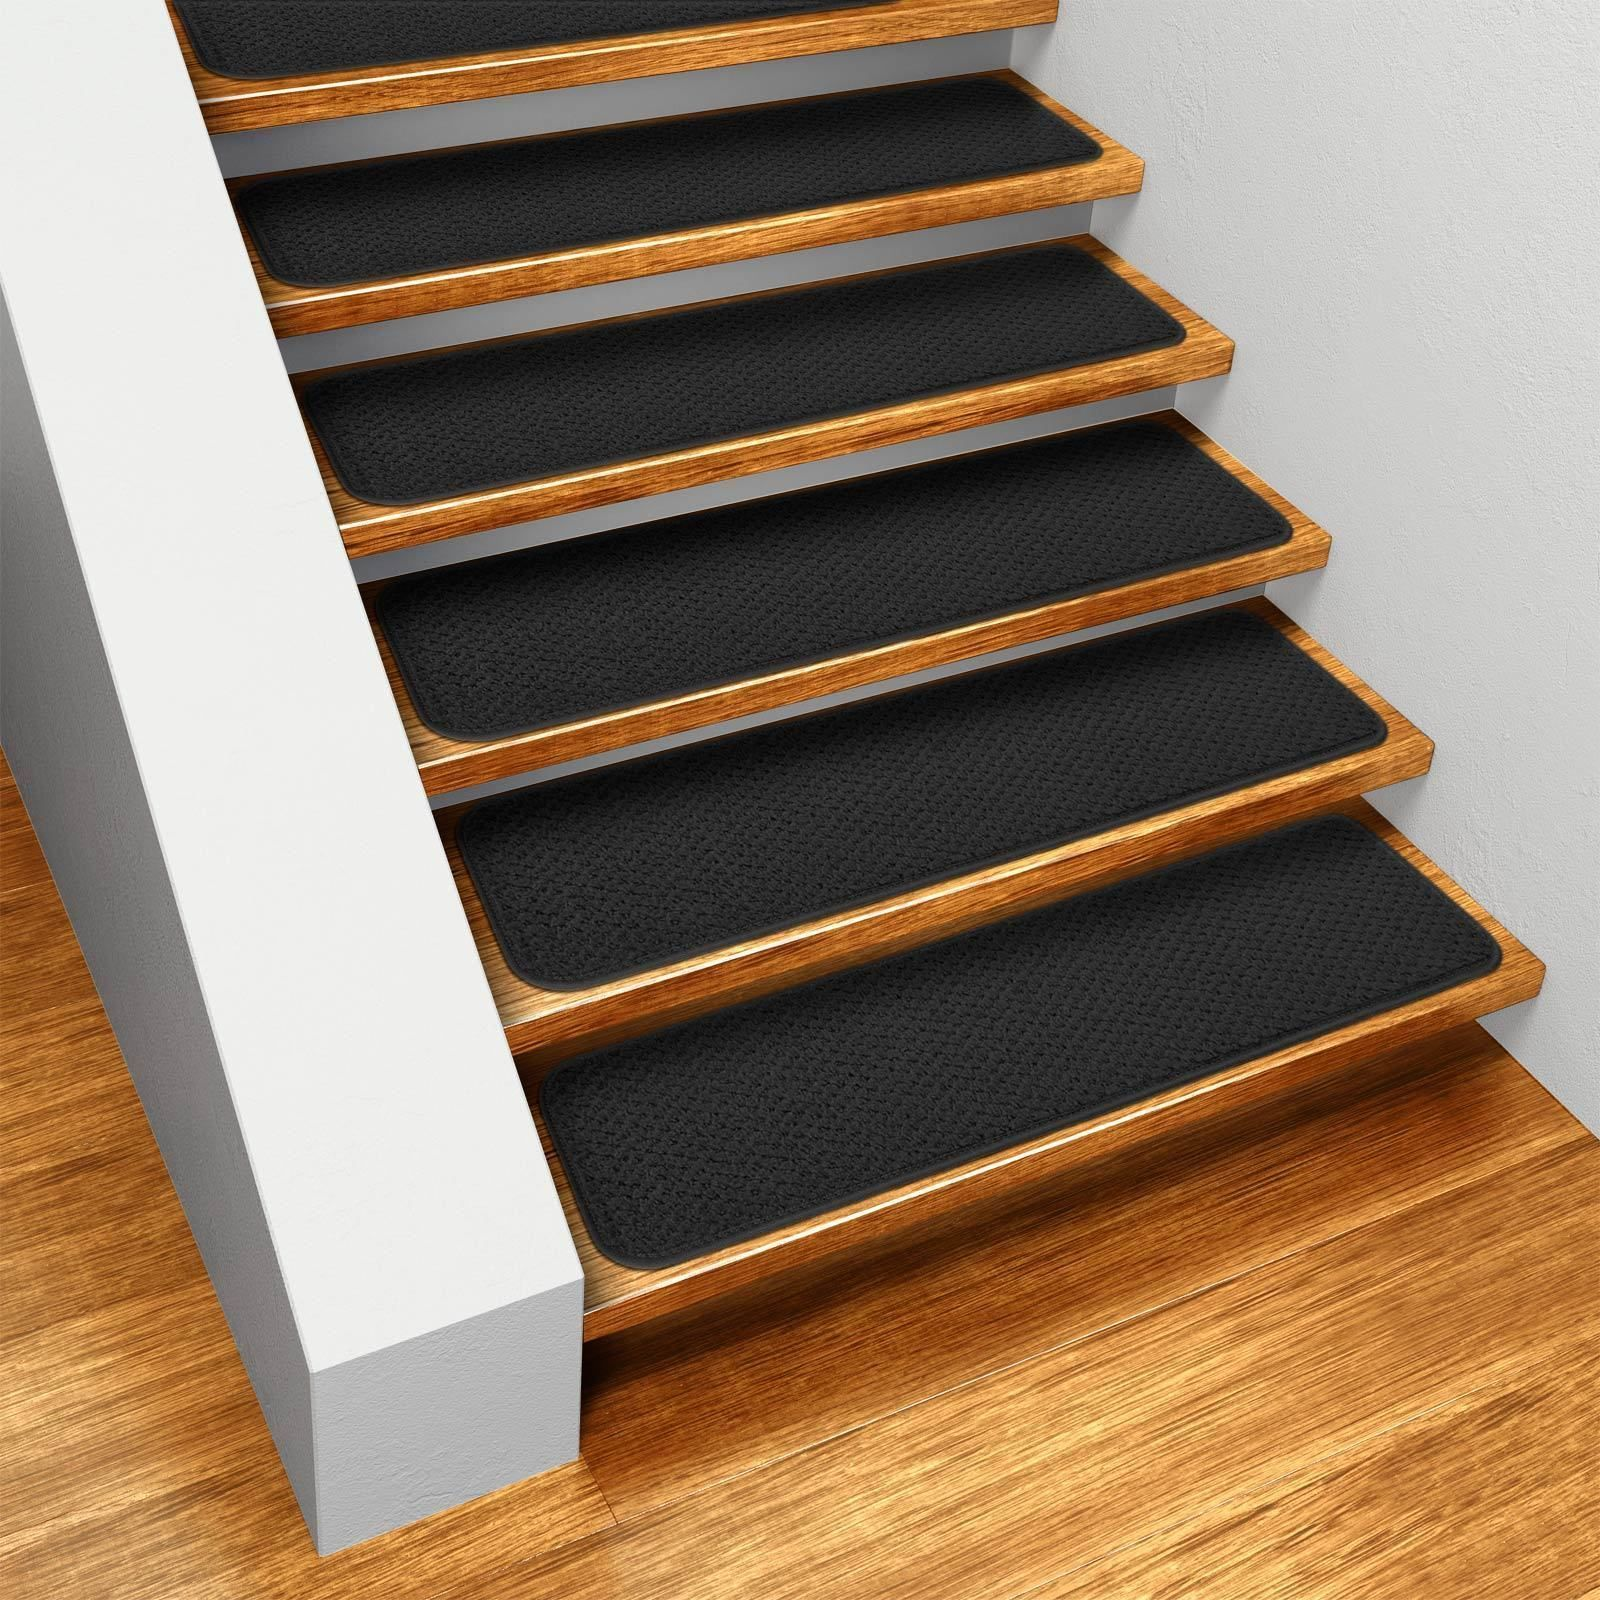 Best Set Of 15 Skid Resistant Carpet Stair Treads Black 400 x 300